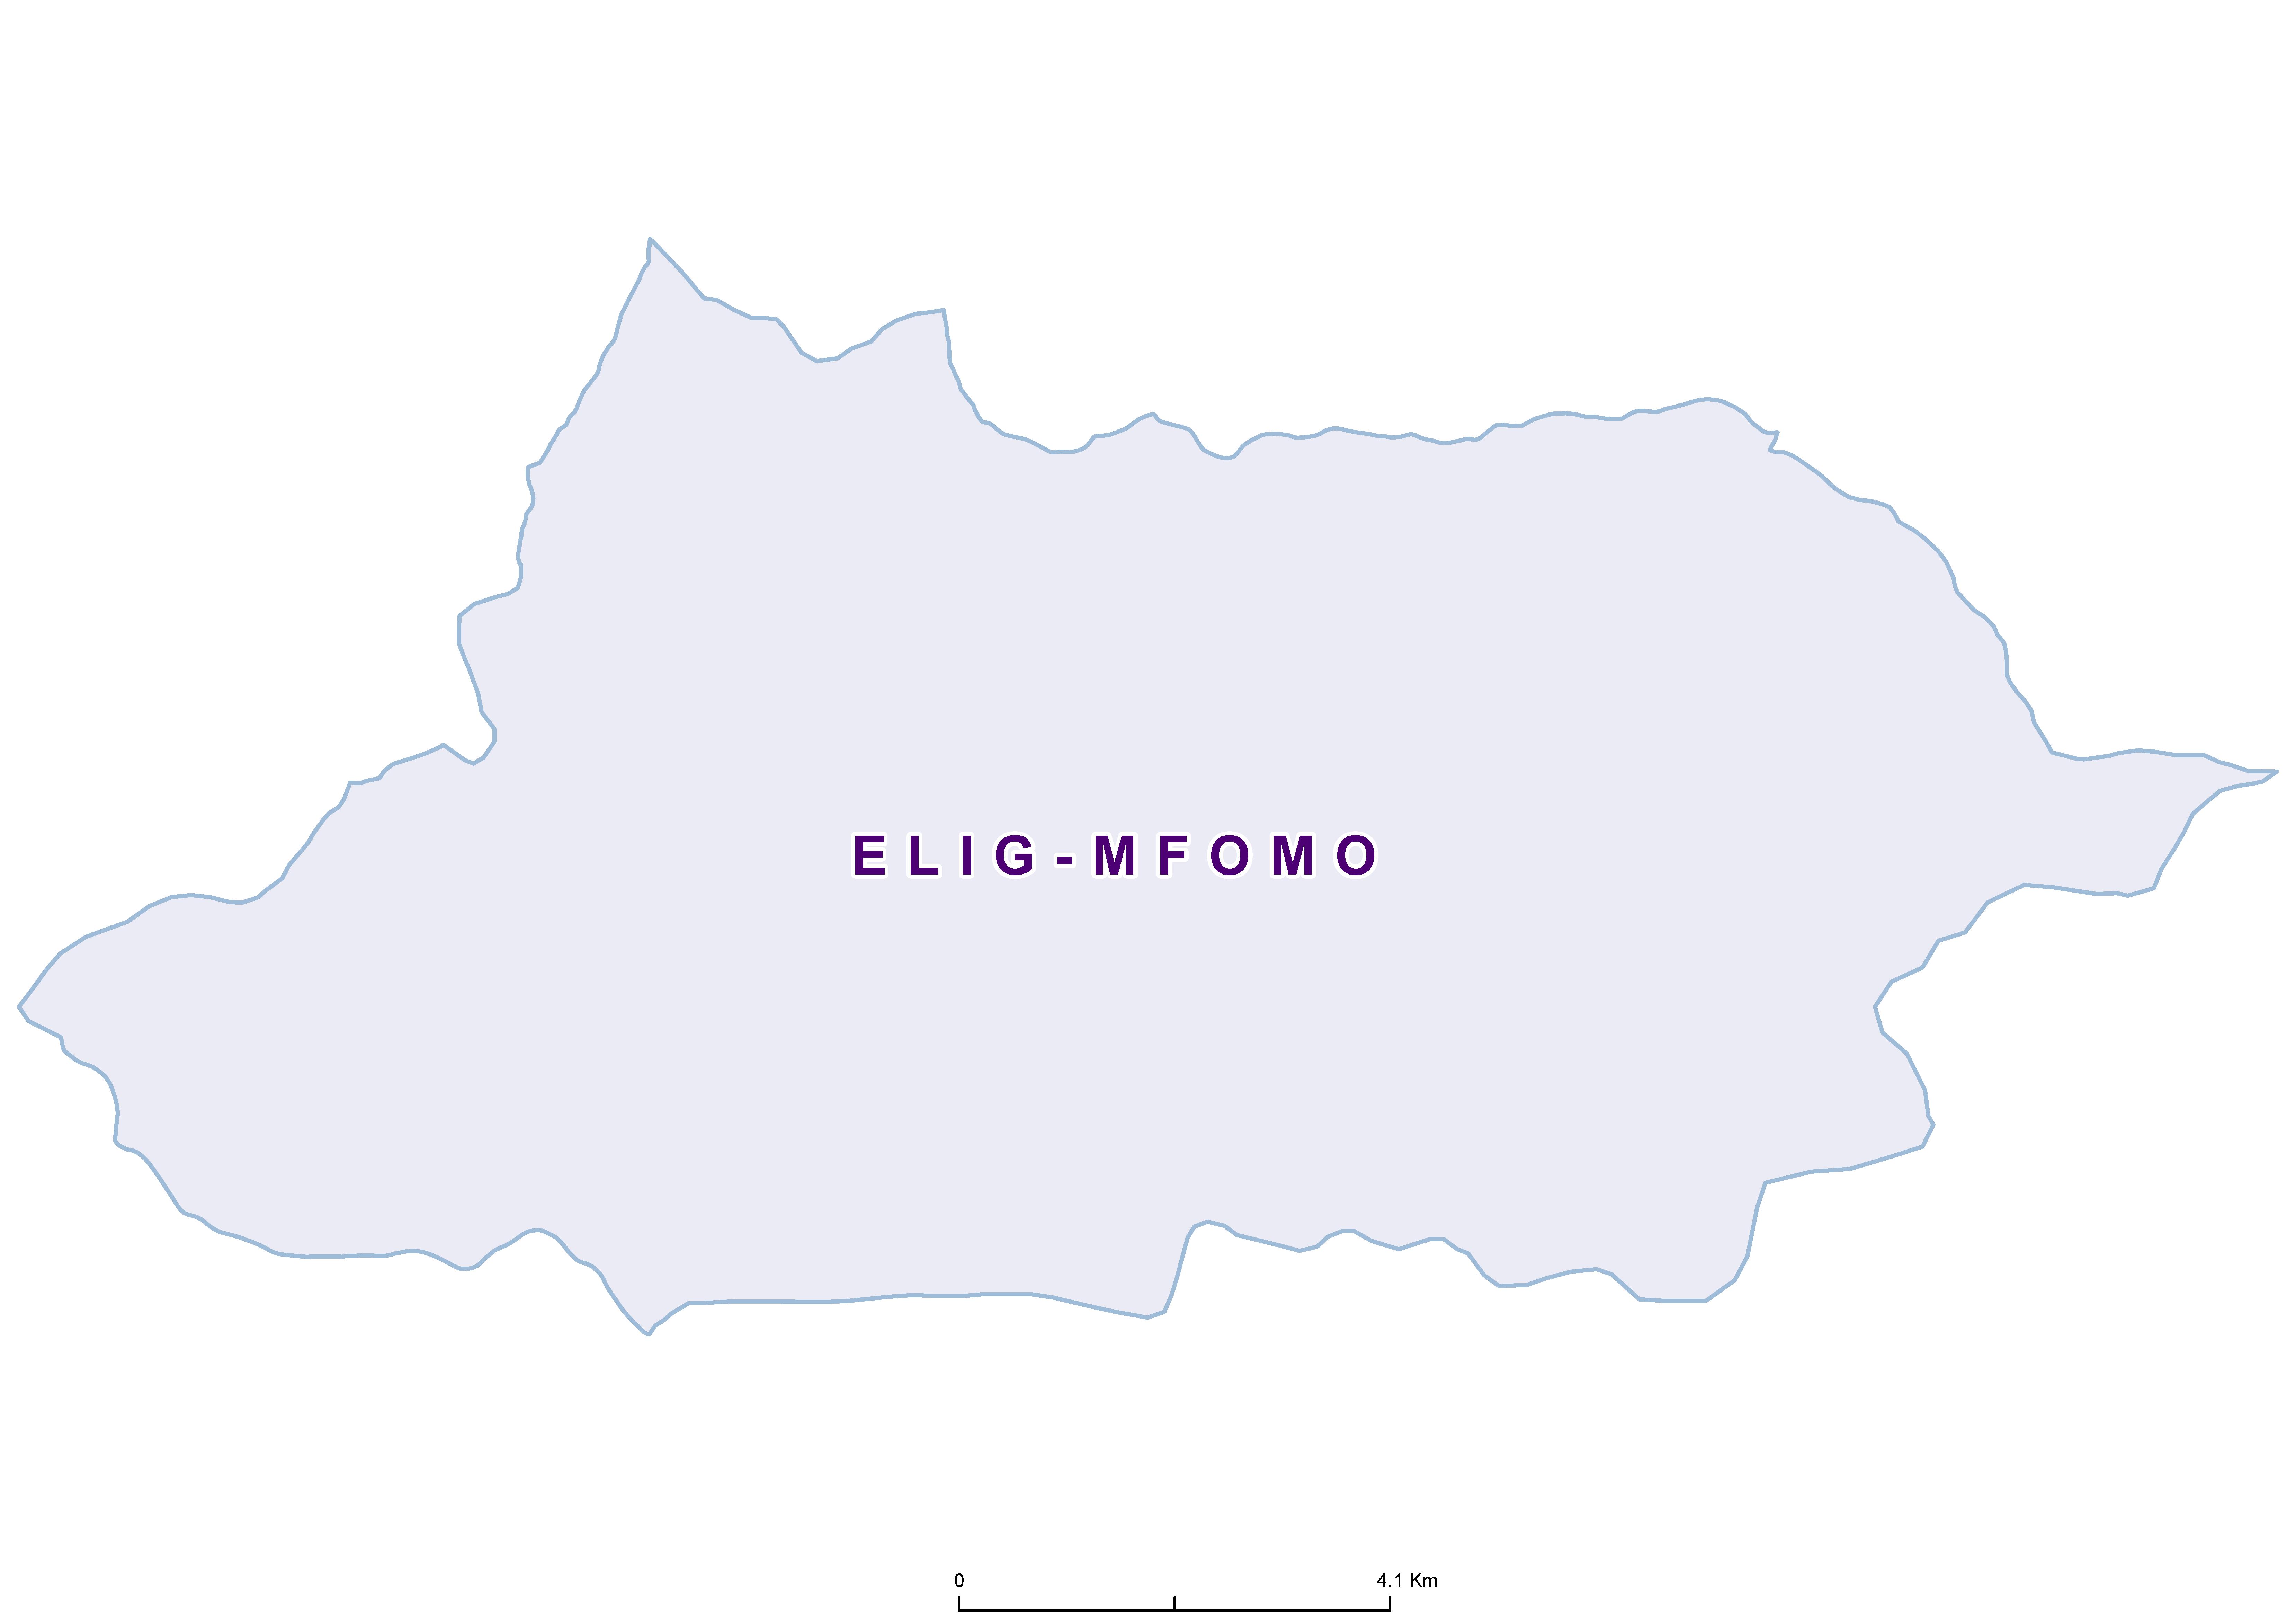 Elig-mfomo Mean STH 19850001